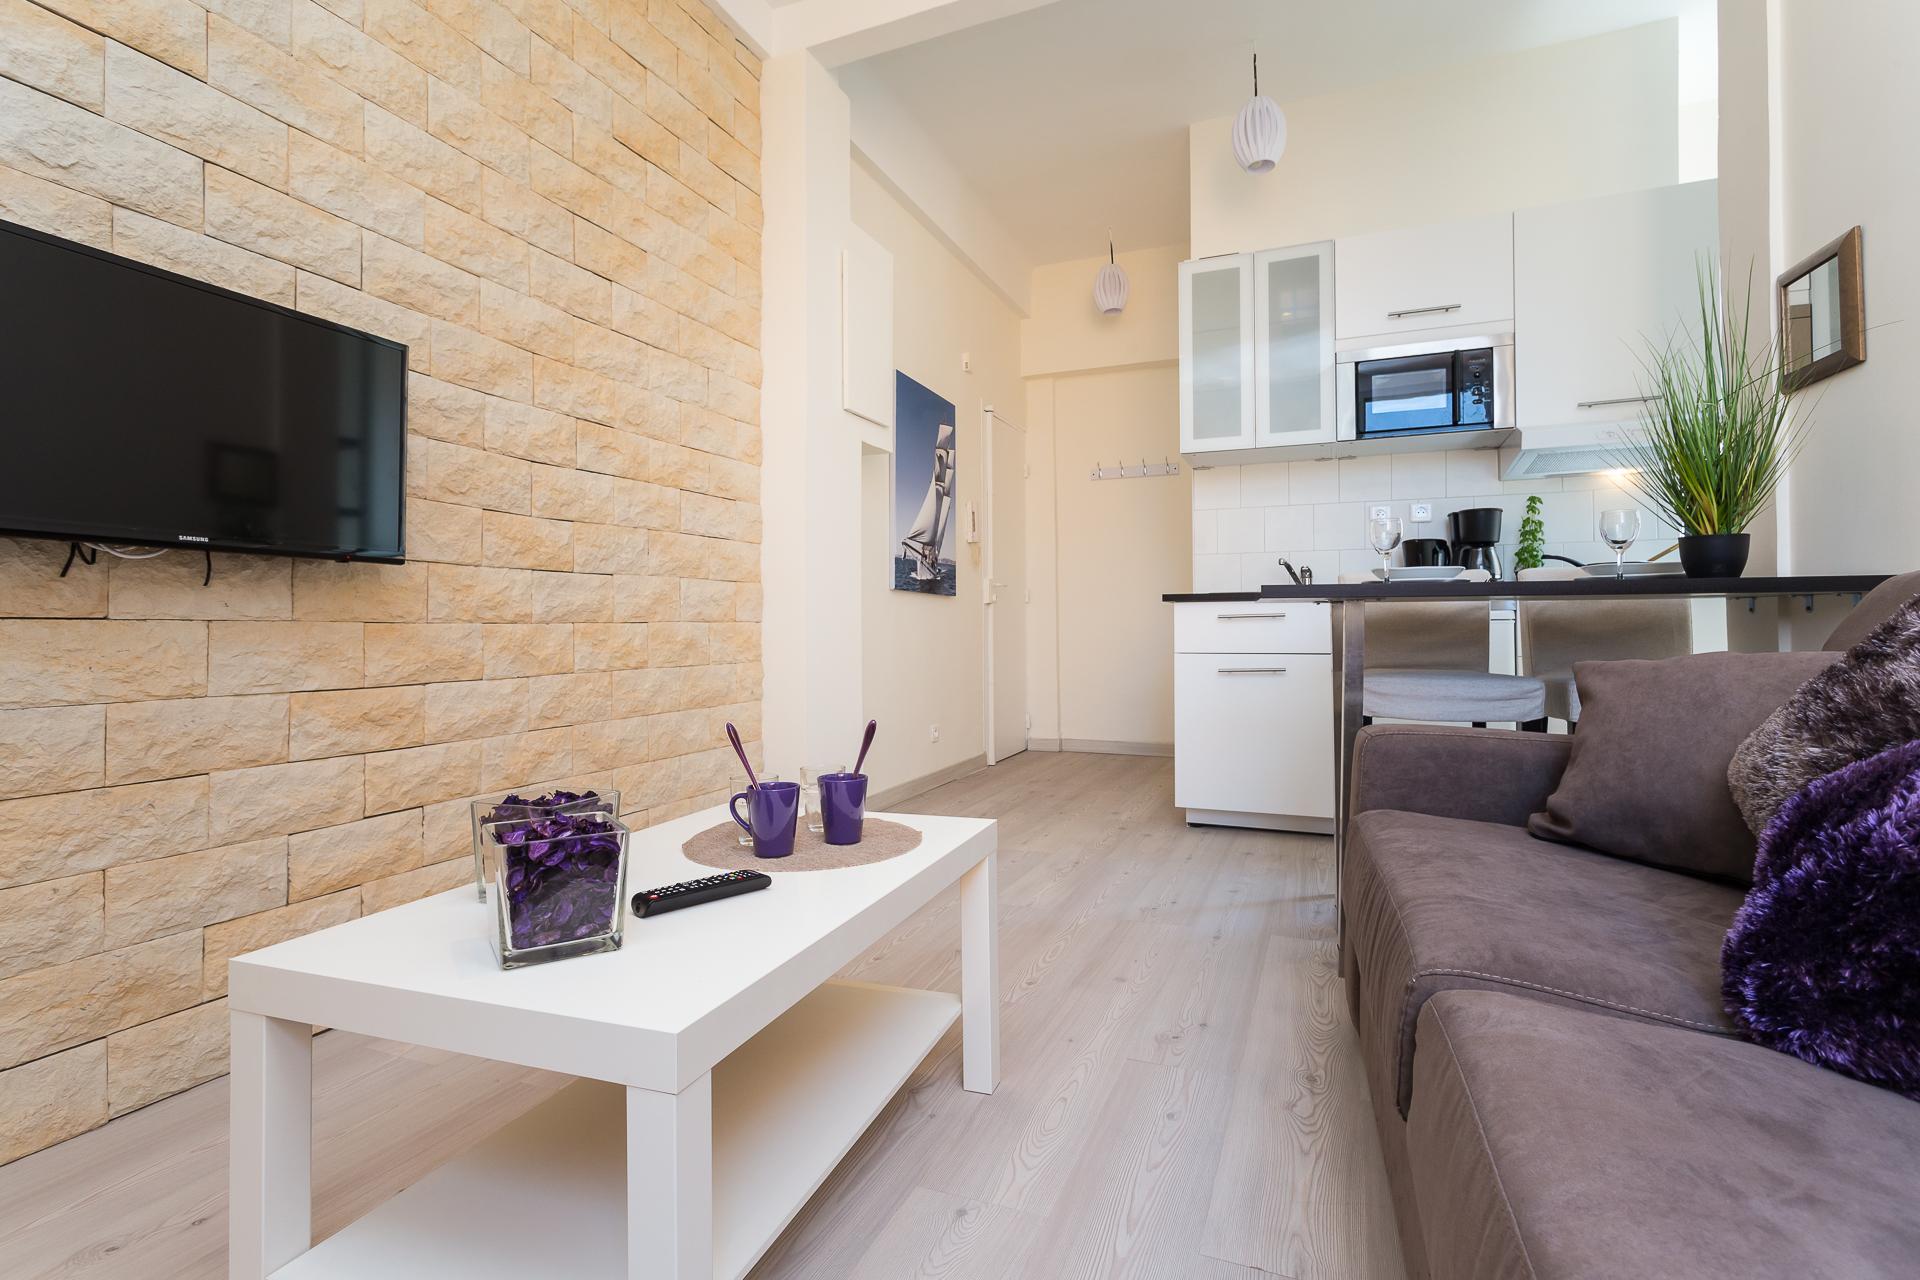 location maison nice. Black Bedroom Furniture Sets. Home Design Ideas